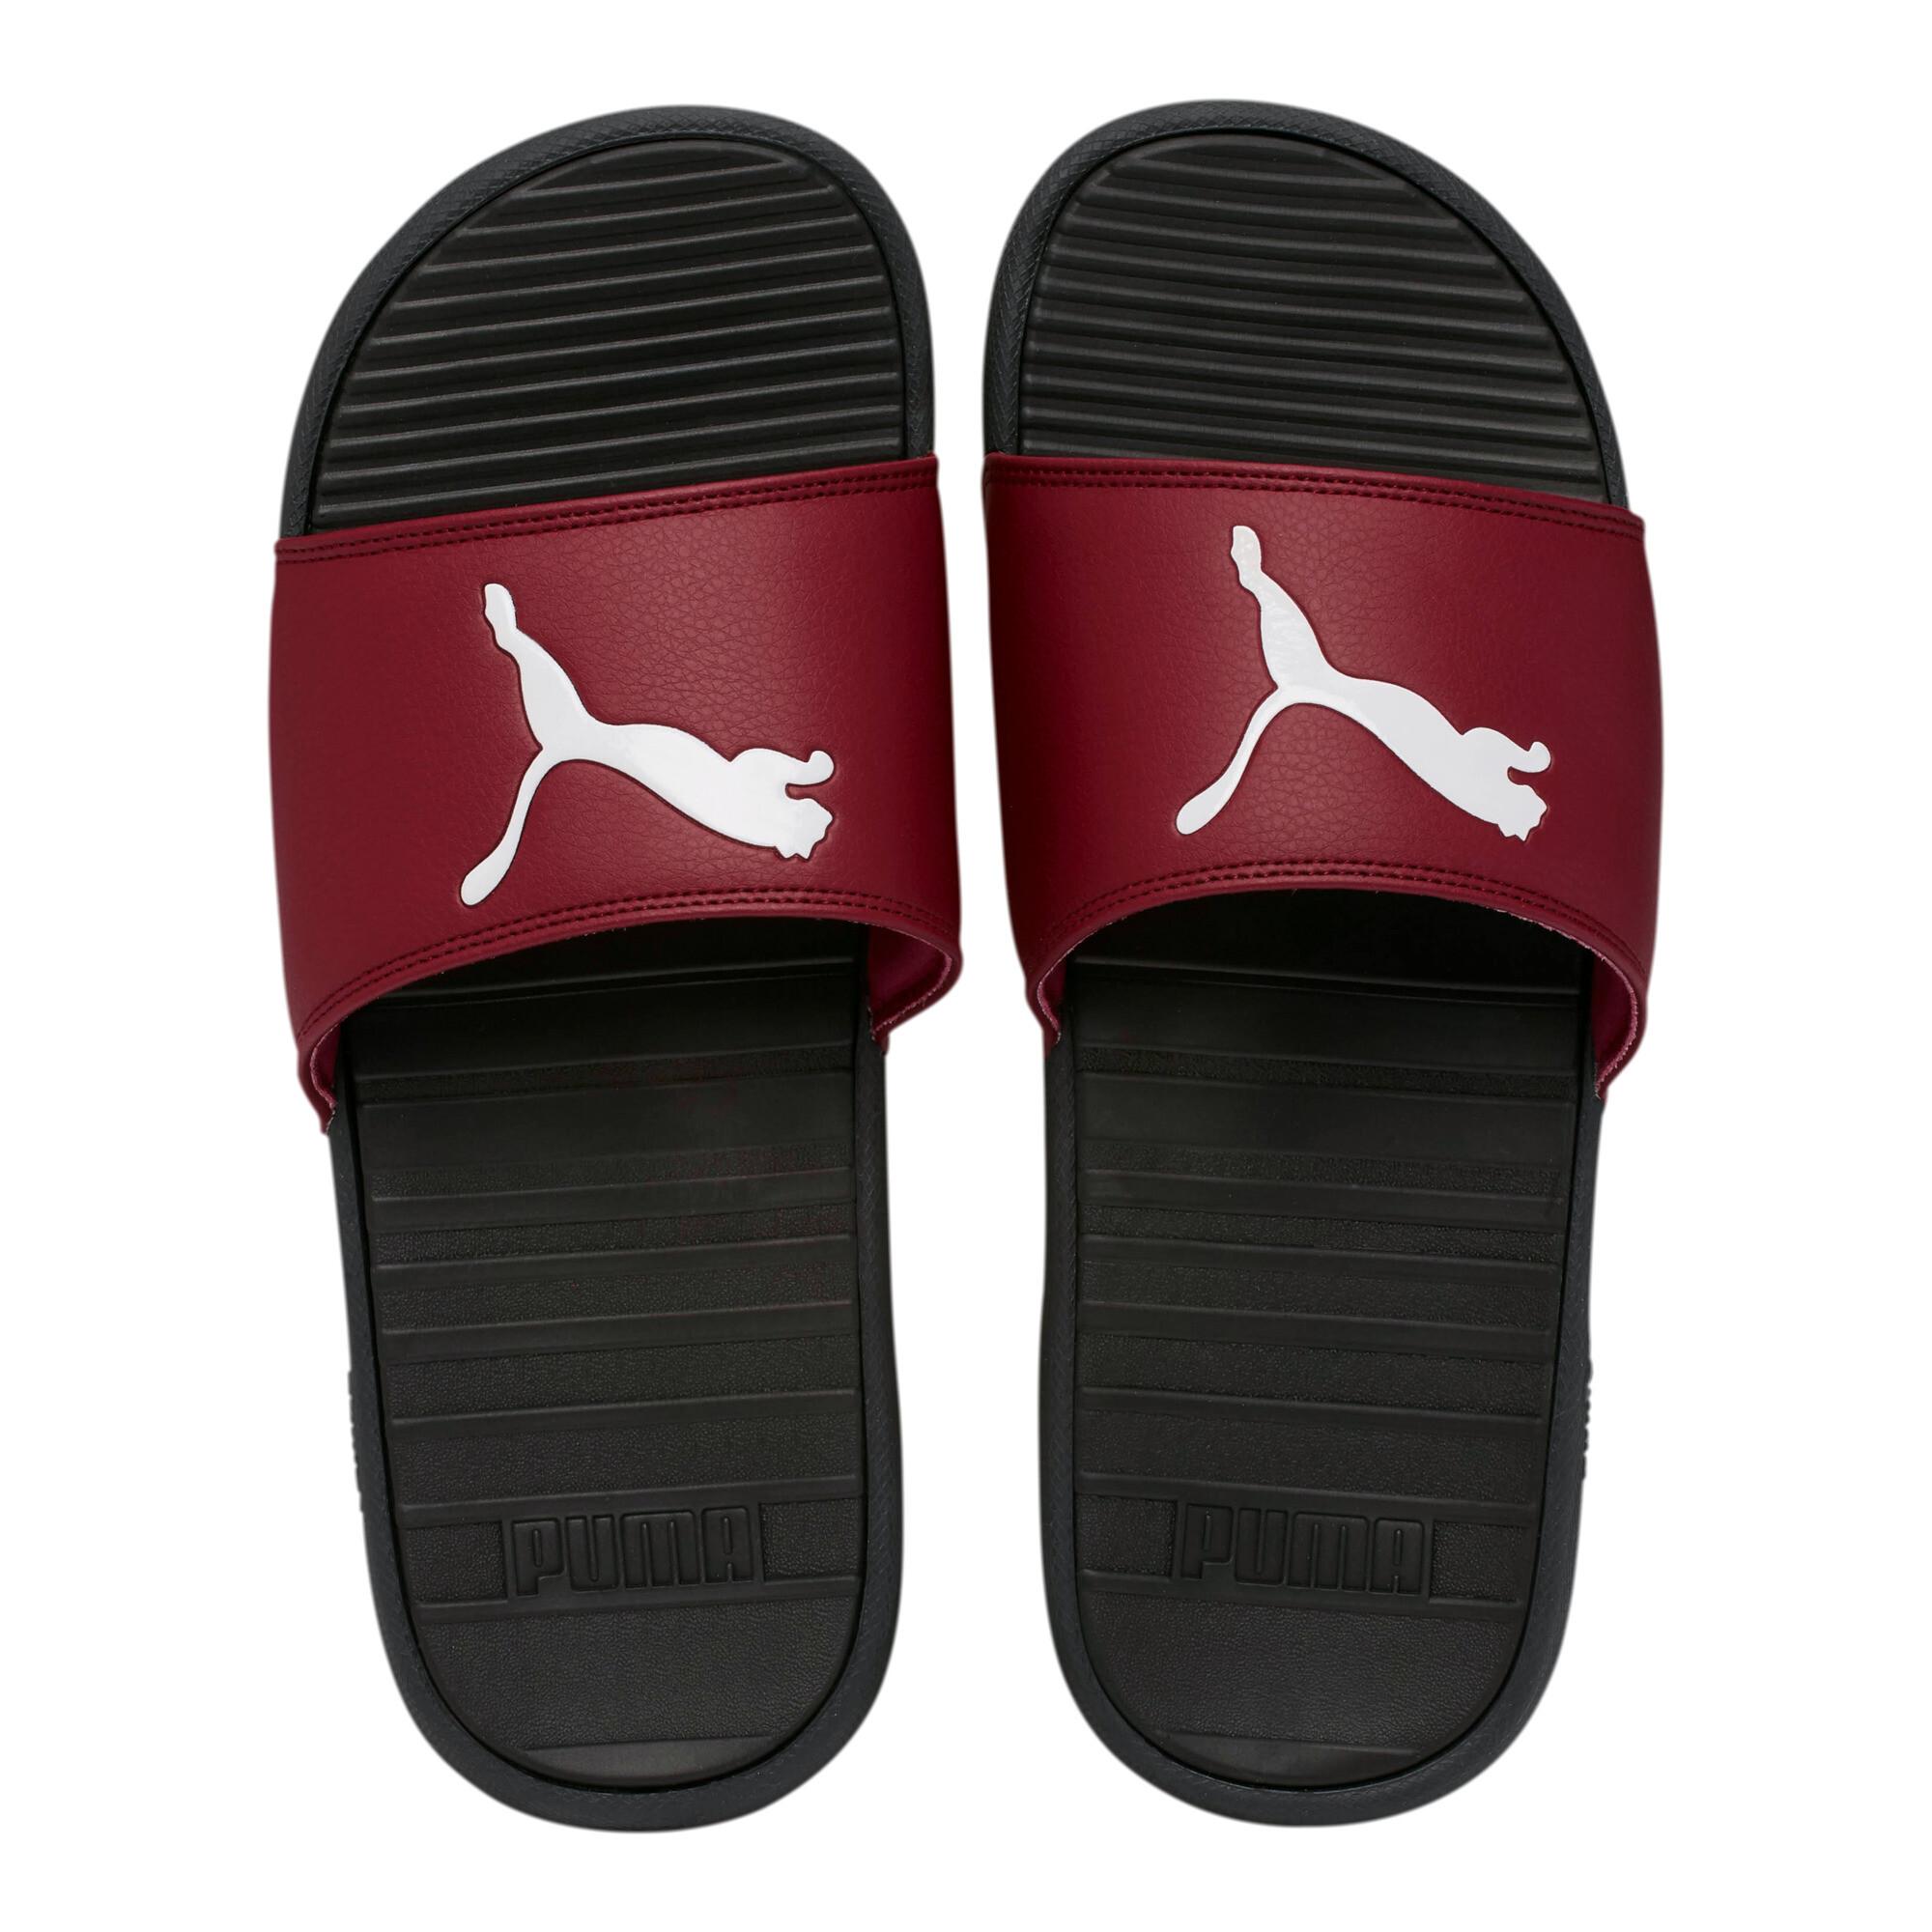 PUMA-Cool-Cat-Sport-Men-039-s-Slides-Men-Sandal-Swimming-Beach thumbnail 12